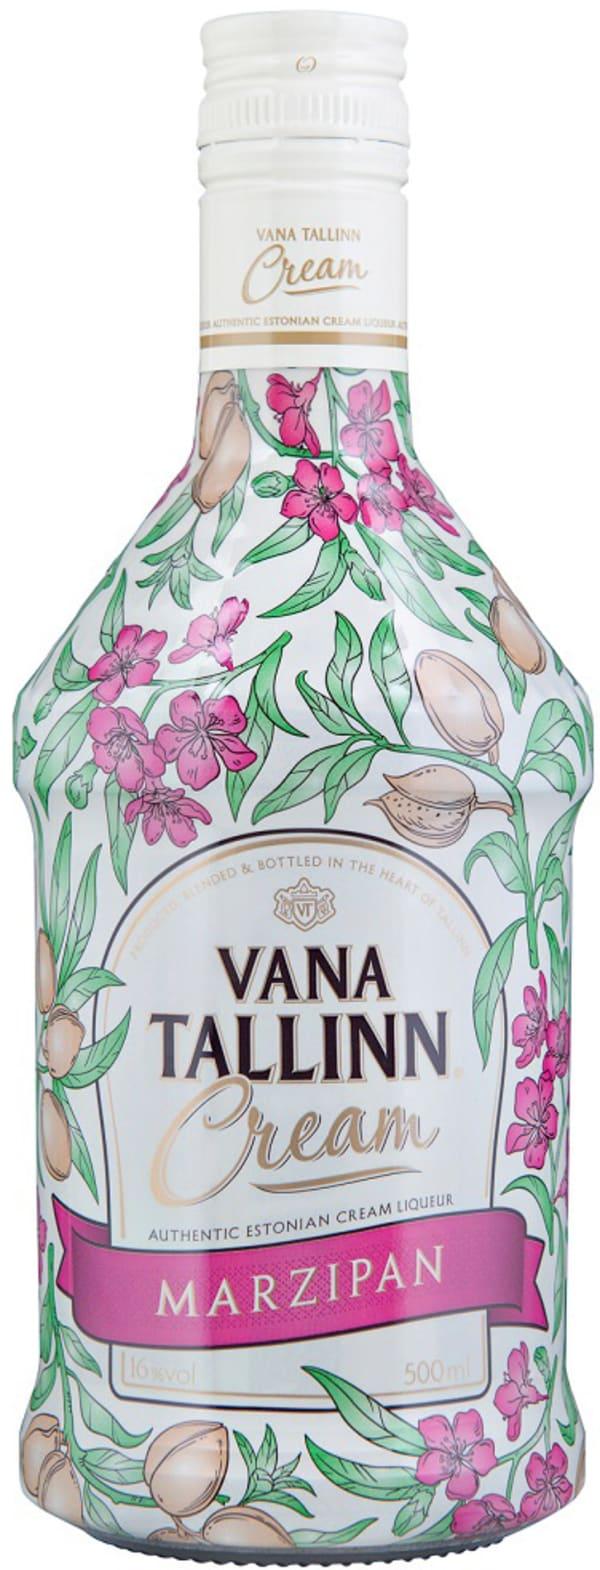 Vana Tallinn Cream Marzipan